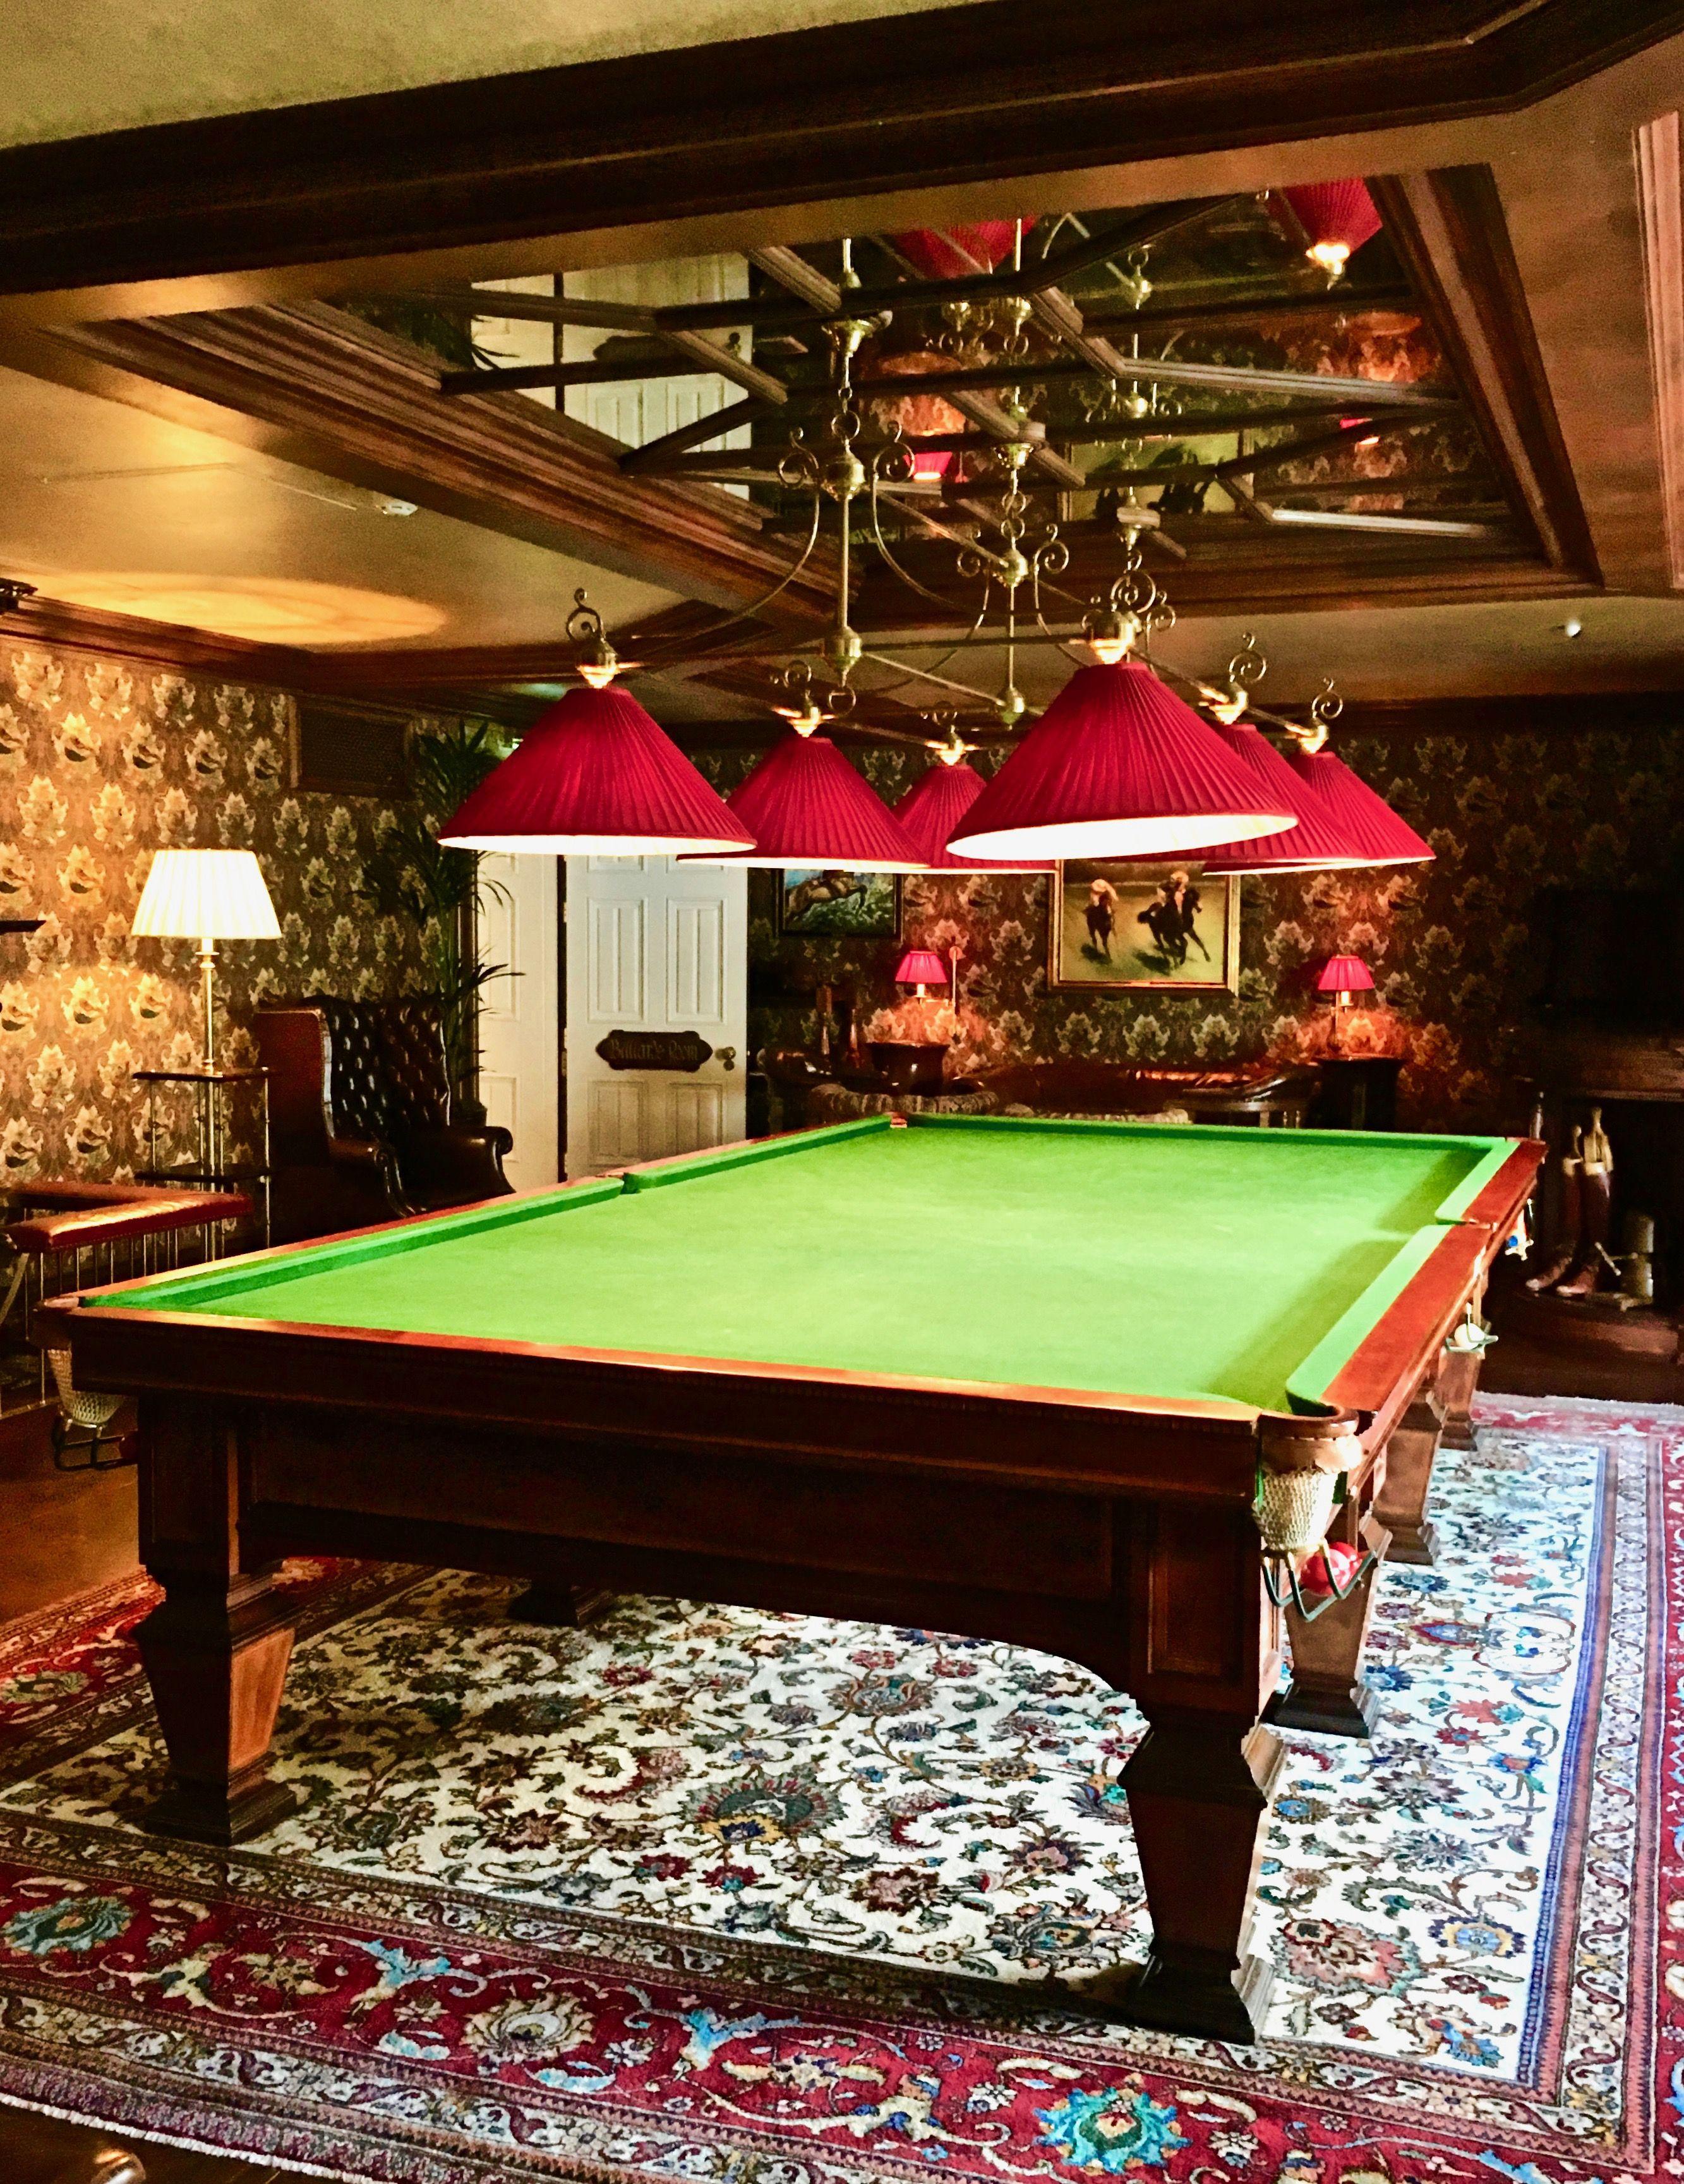 The Billiard Room at historic Ashford Castle